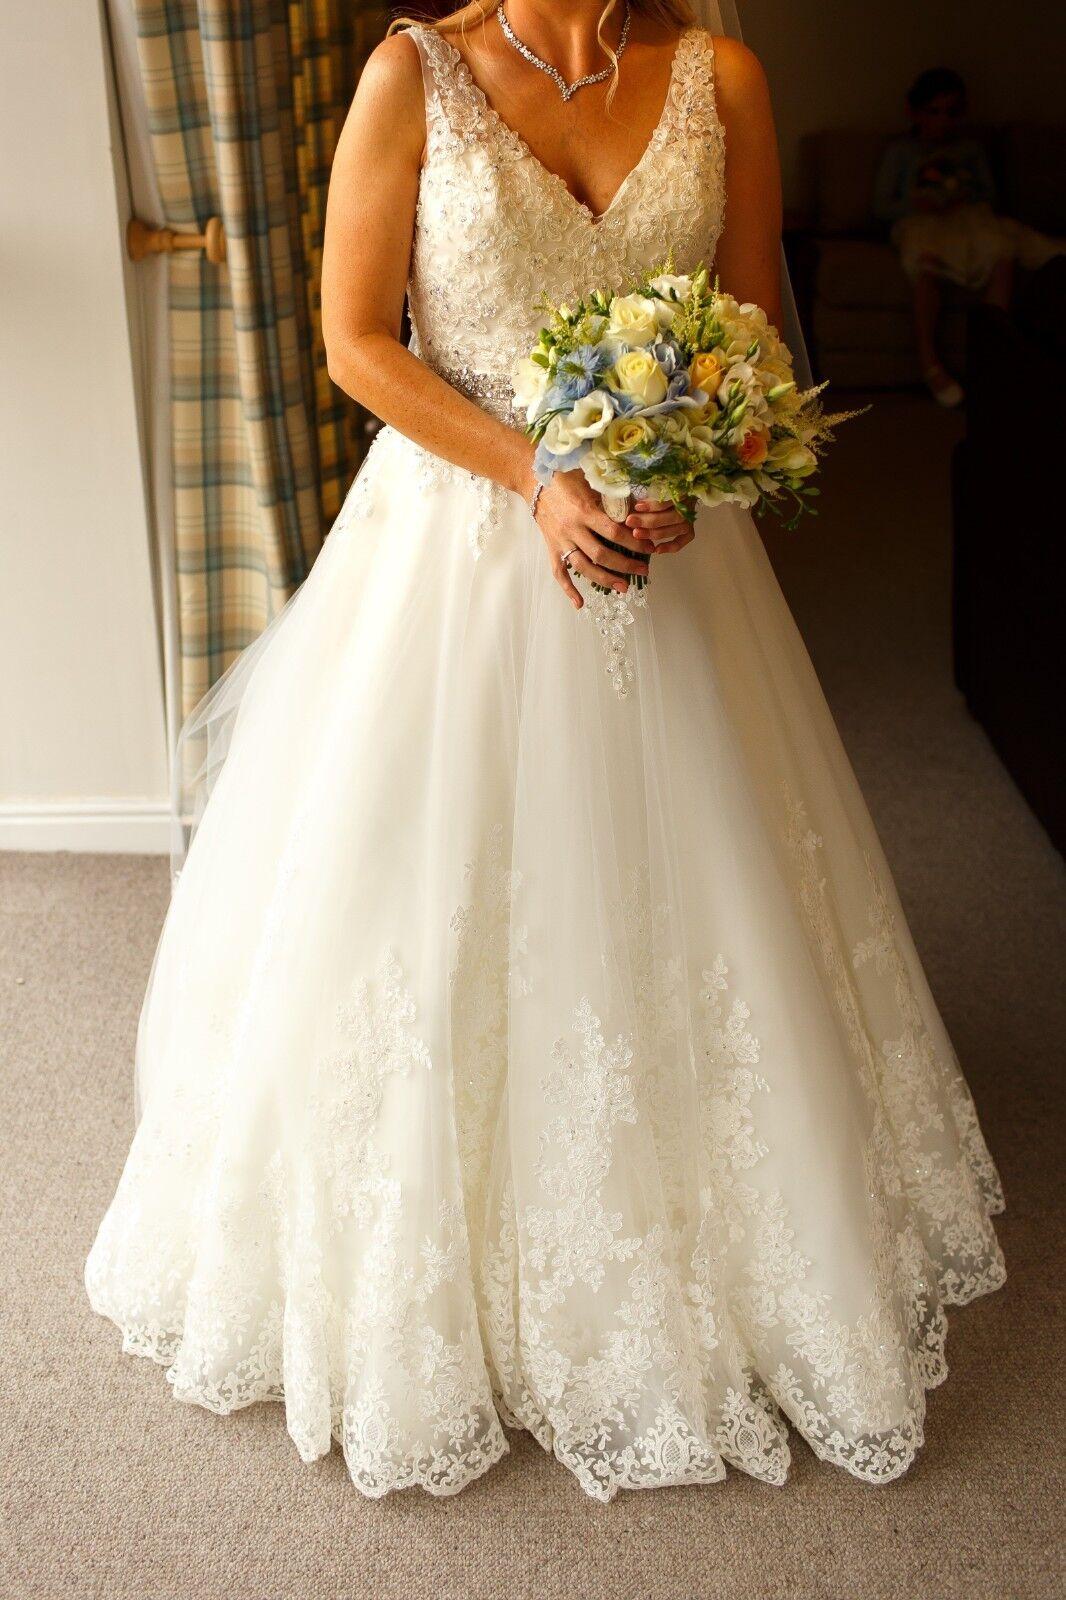 Morilee wedding dress 2821. Size 10. Worn once.